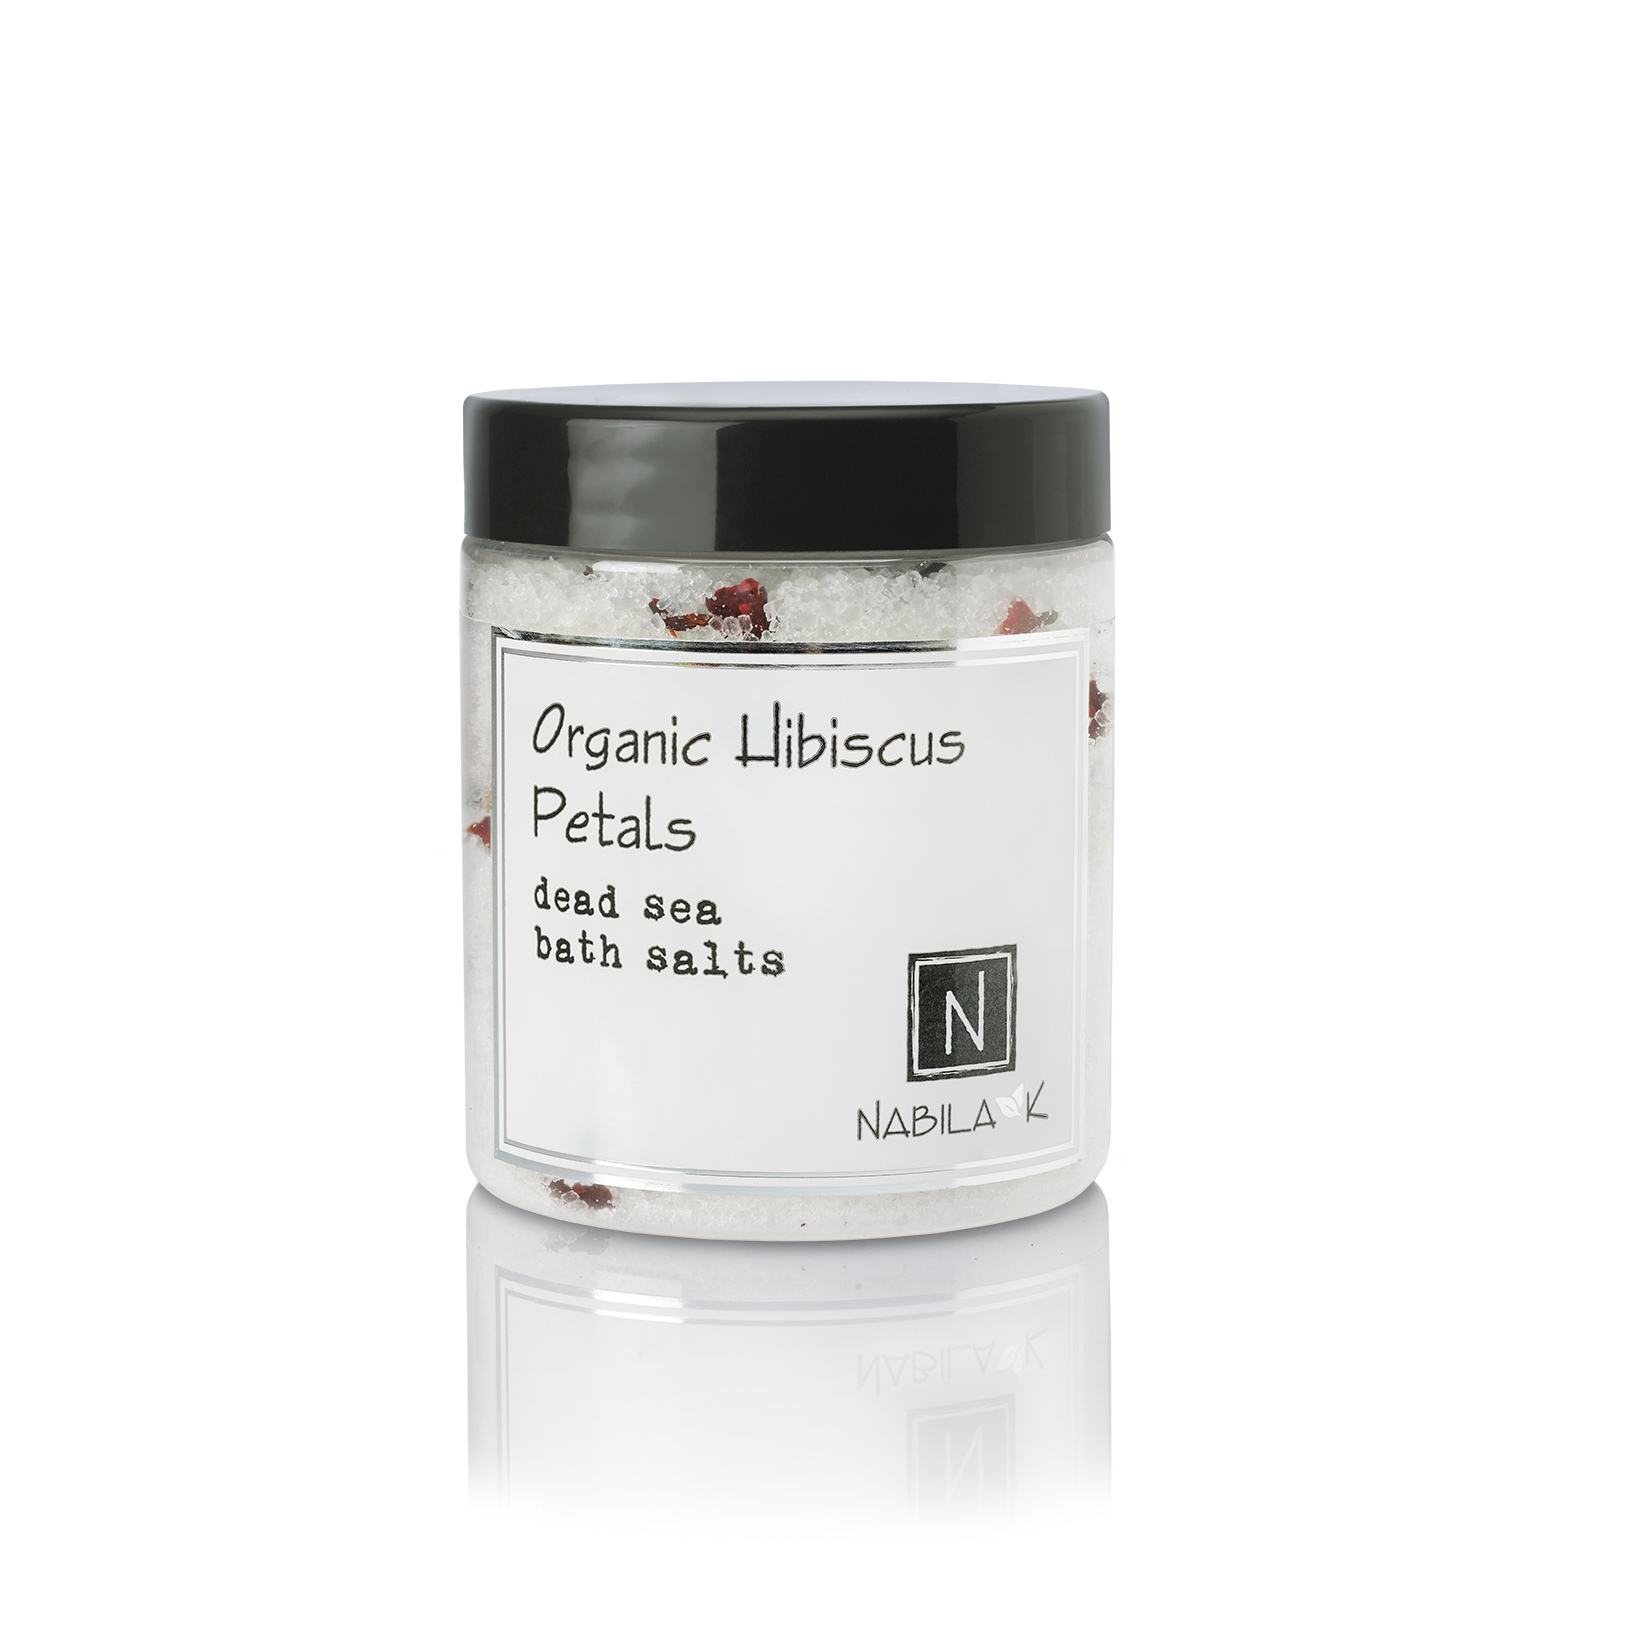 Large Sized Version of Nabila K's Organic Hibiscus Petals Dead Sea Bath Salts